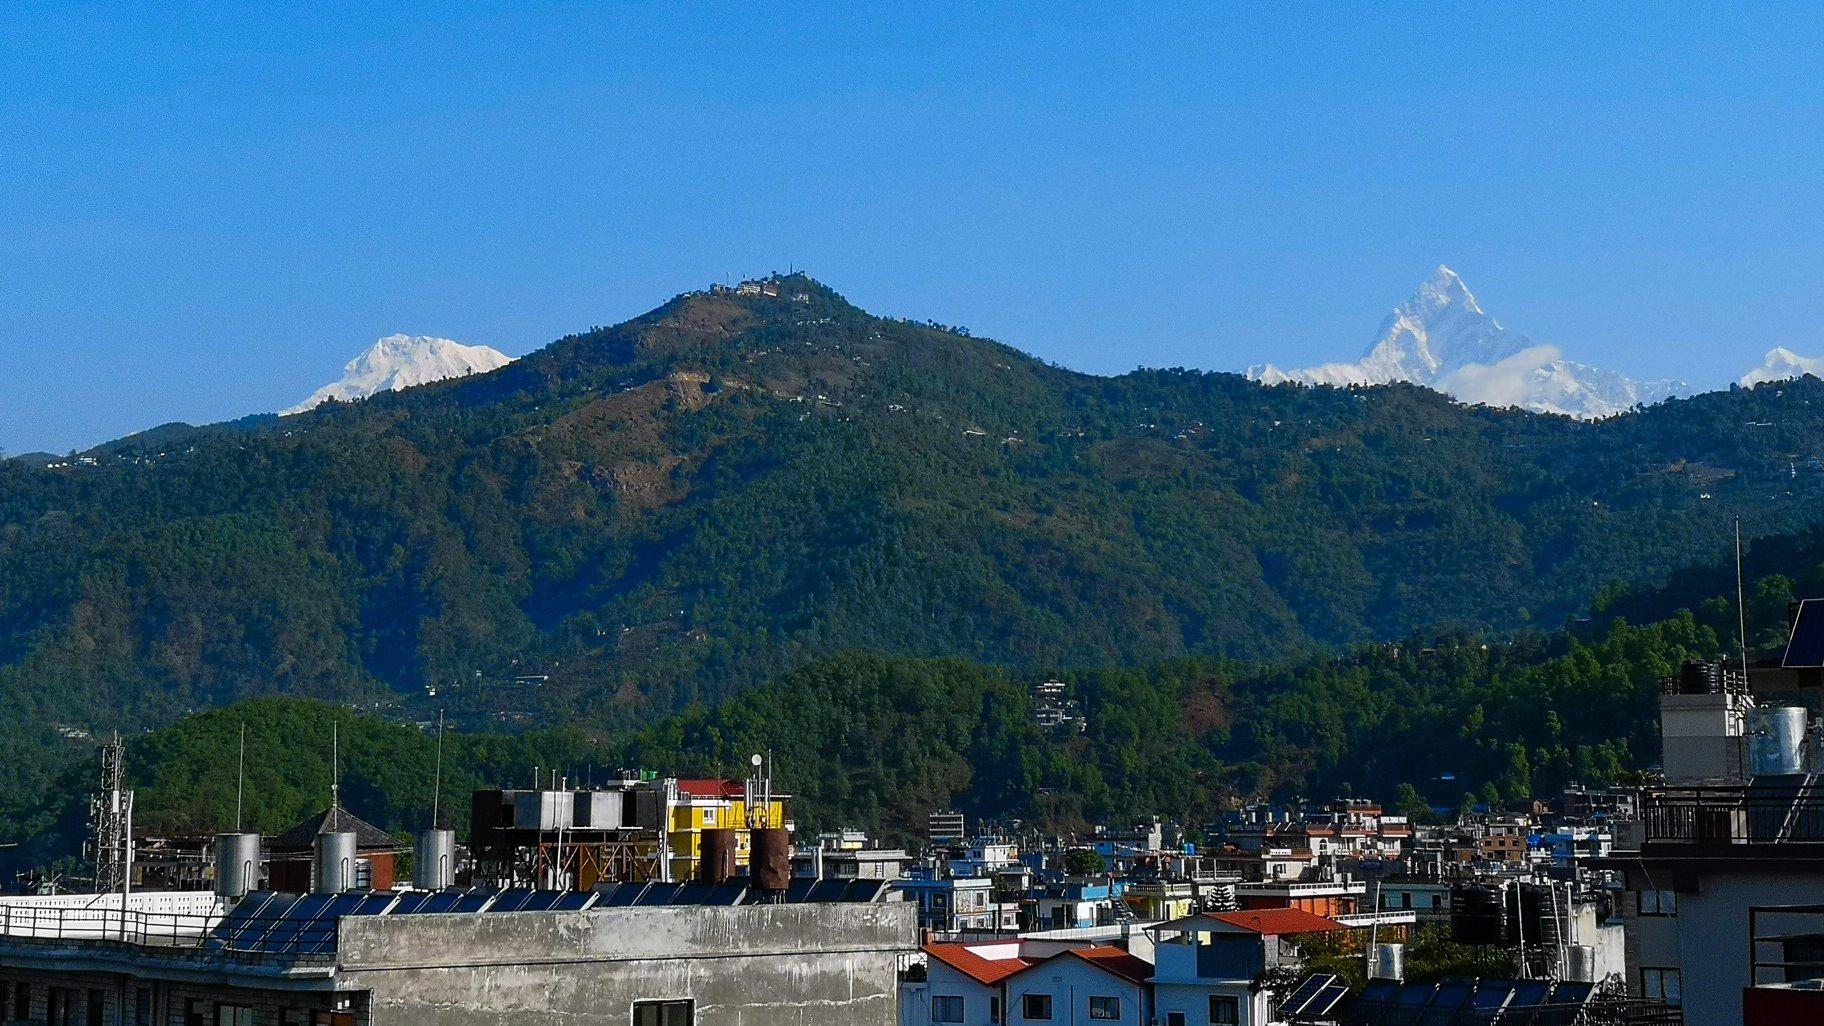 Pokhara hotel view